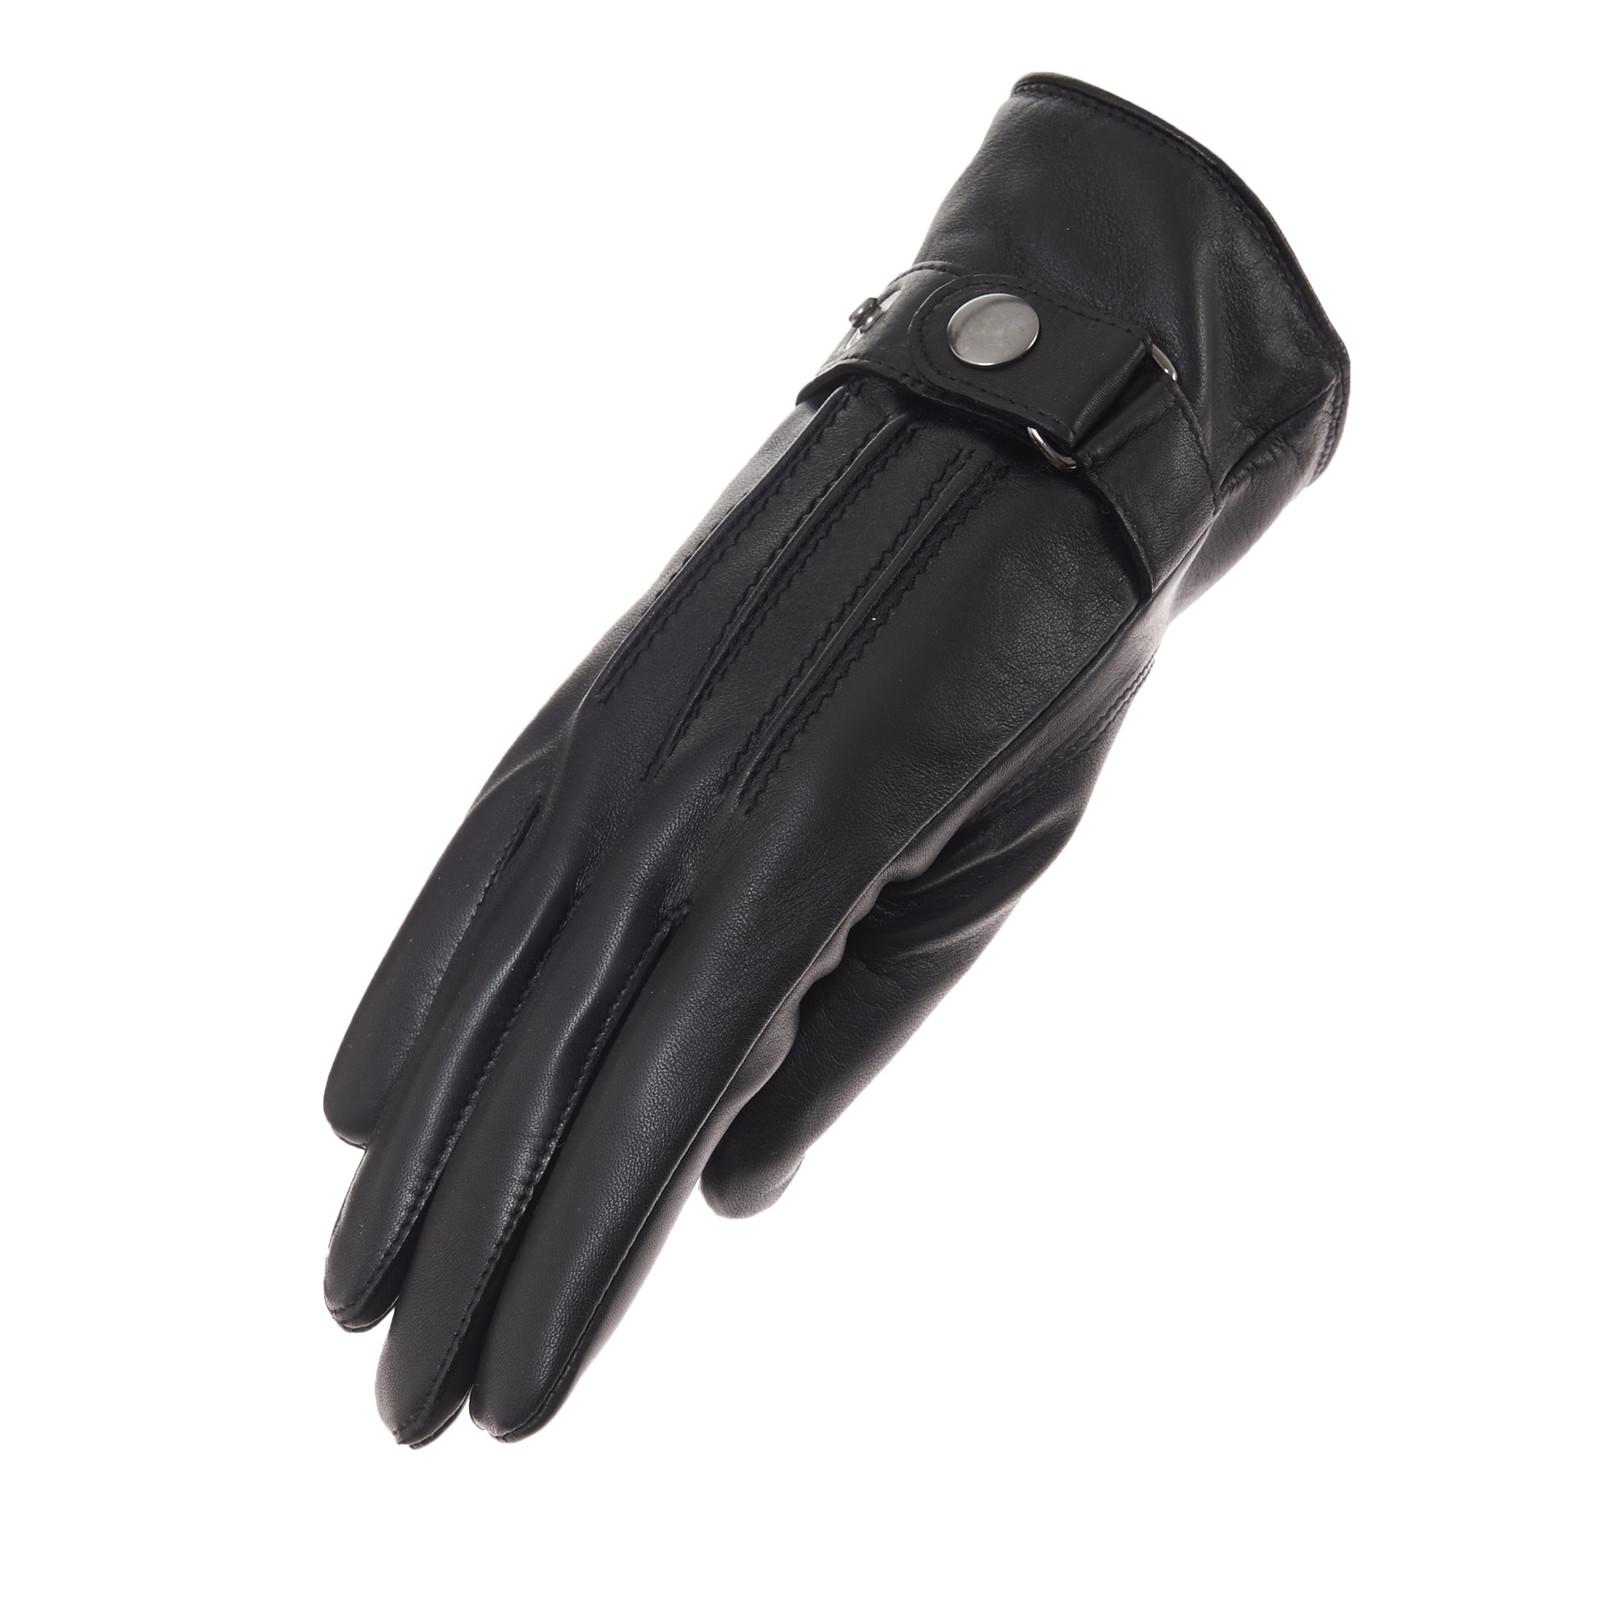 Randers Handsker herrehandske i lammeskind